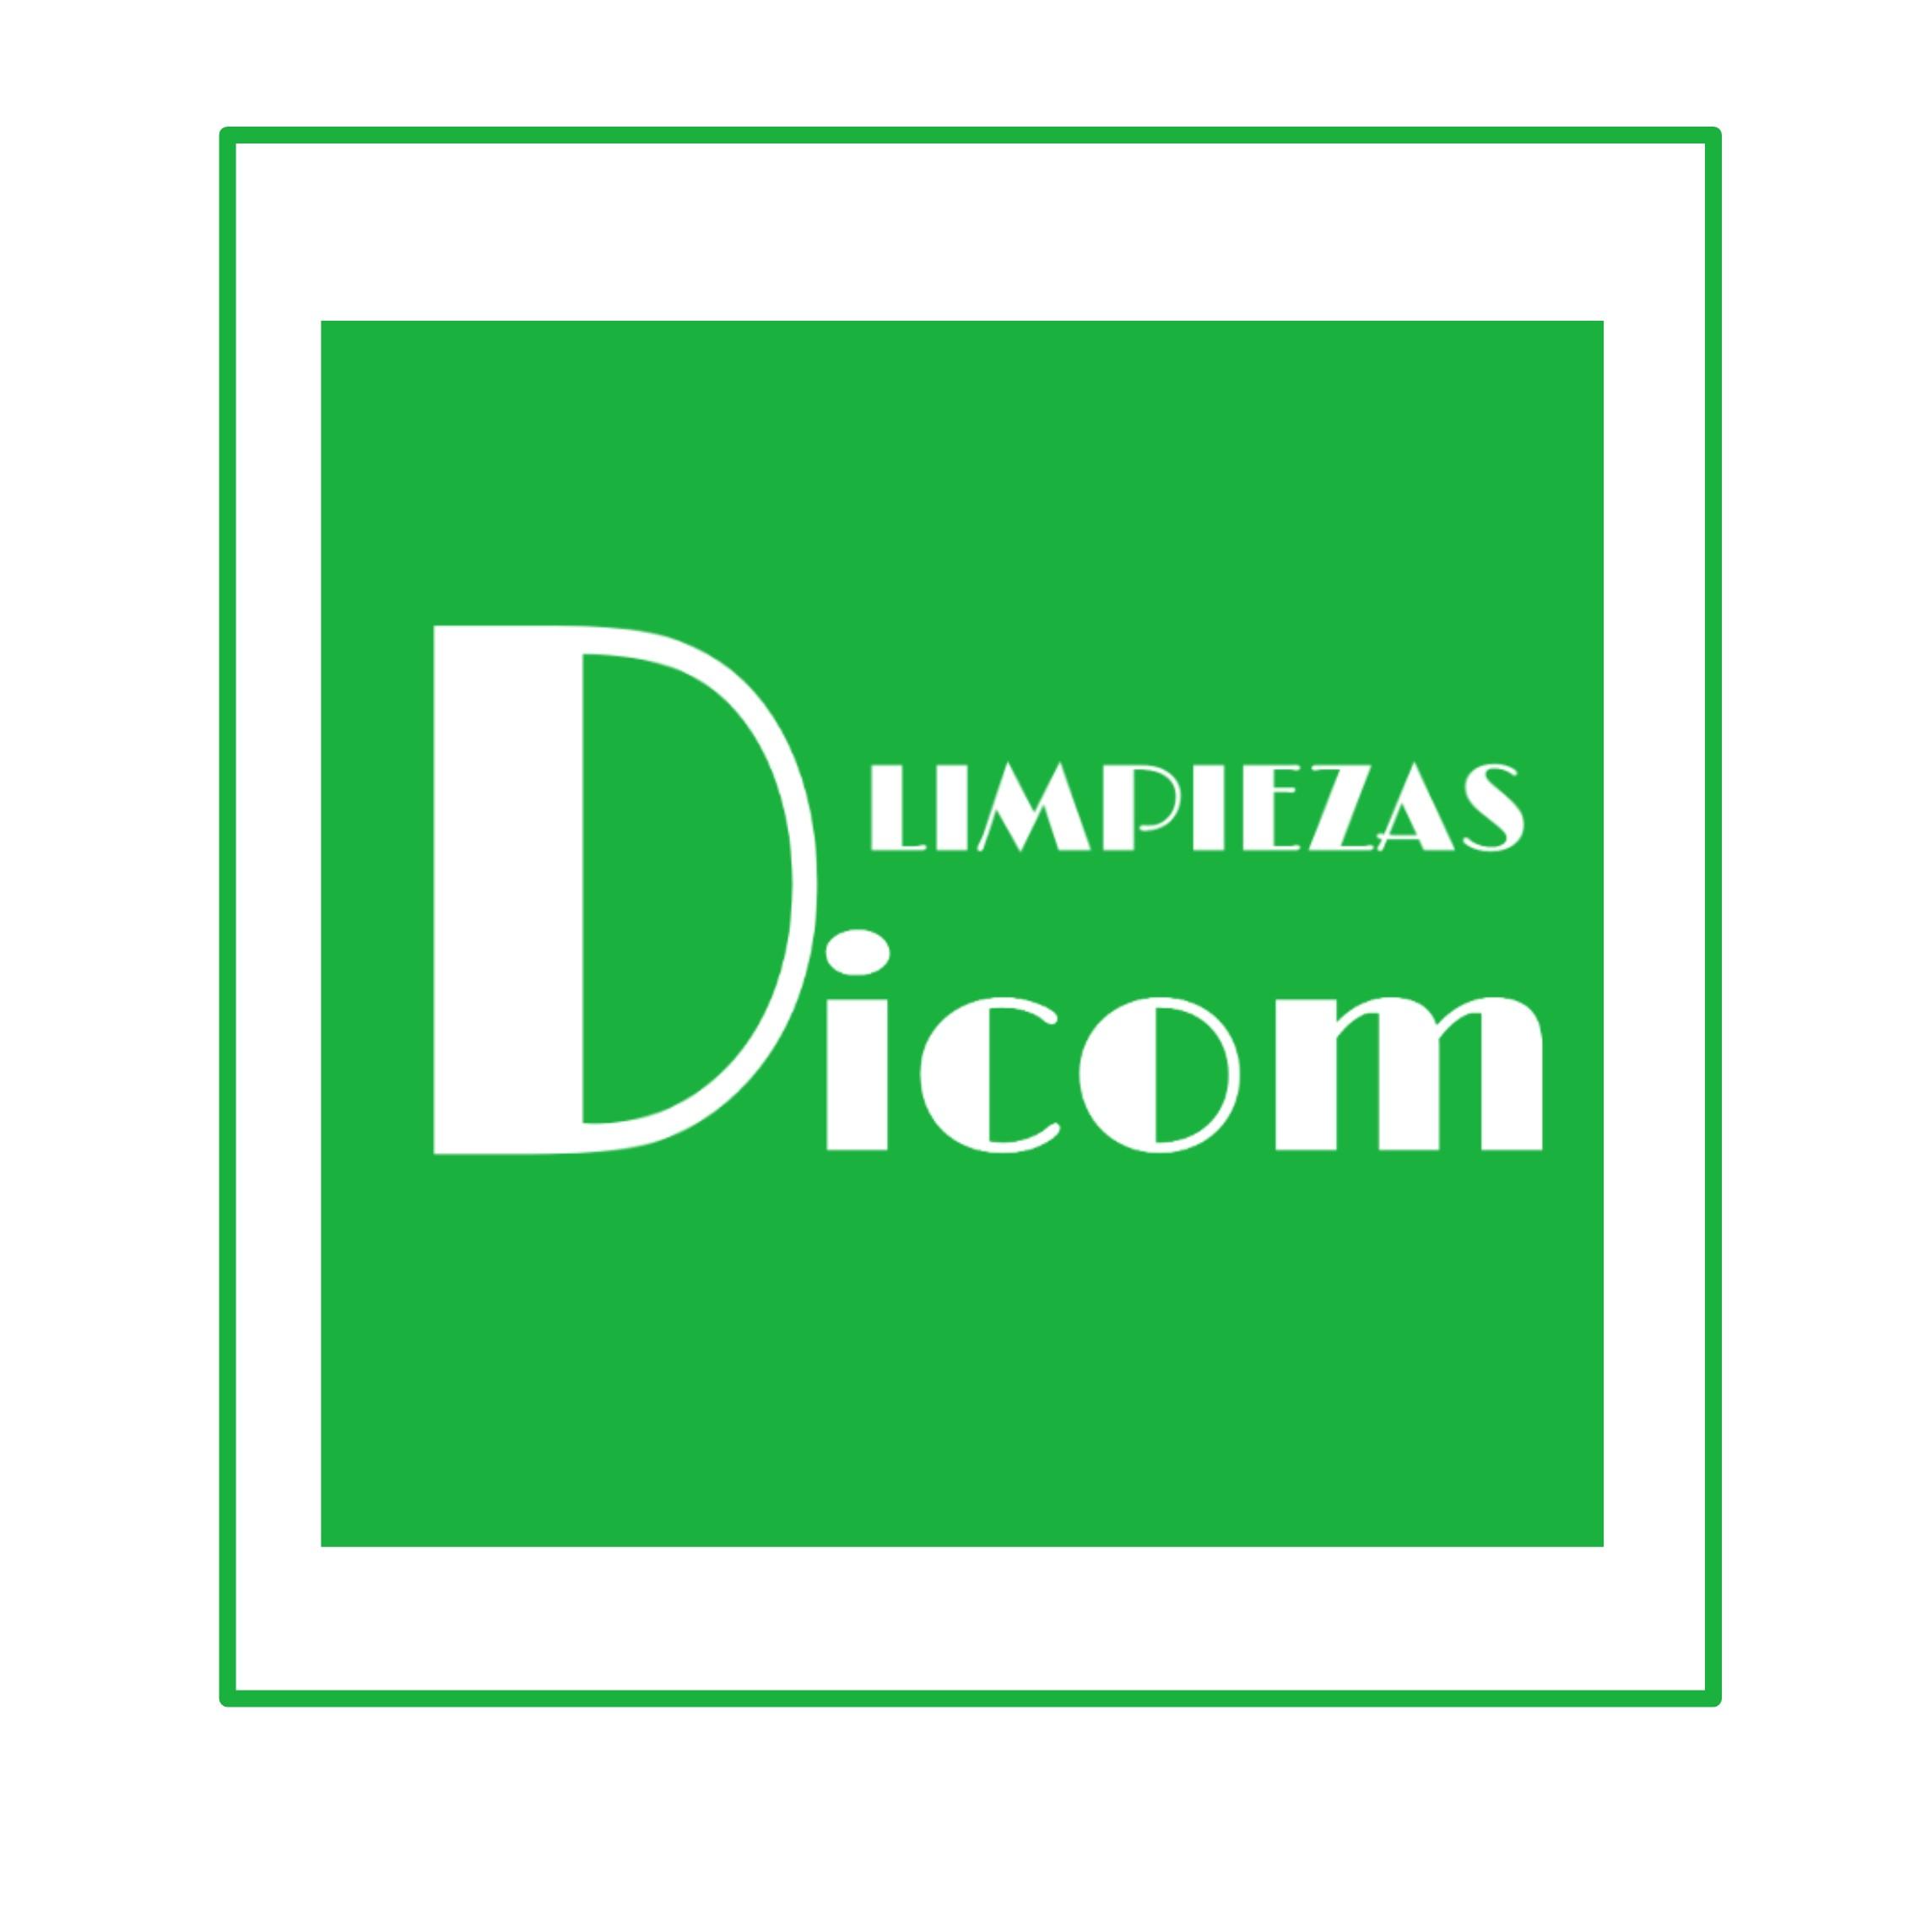 Limpiezas Dicom